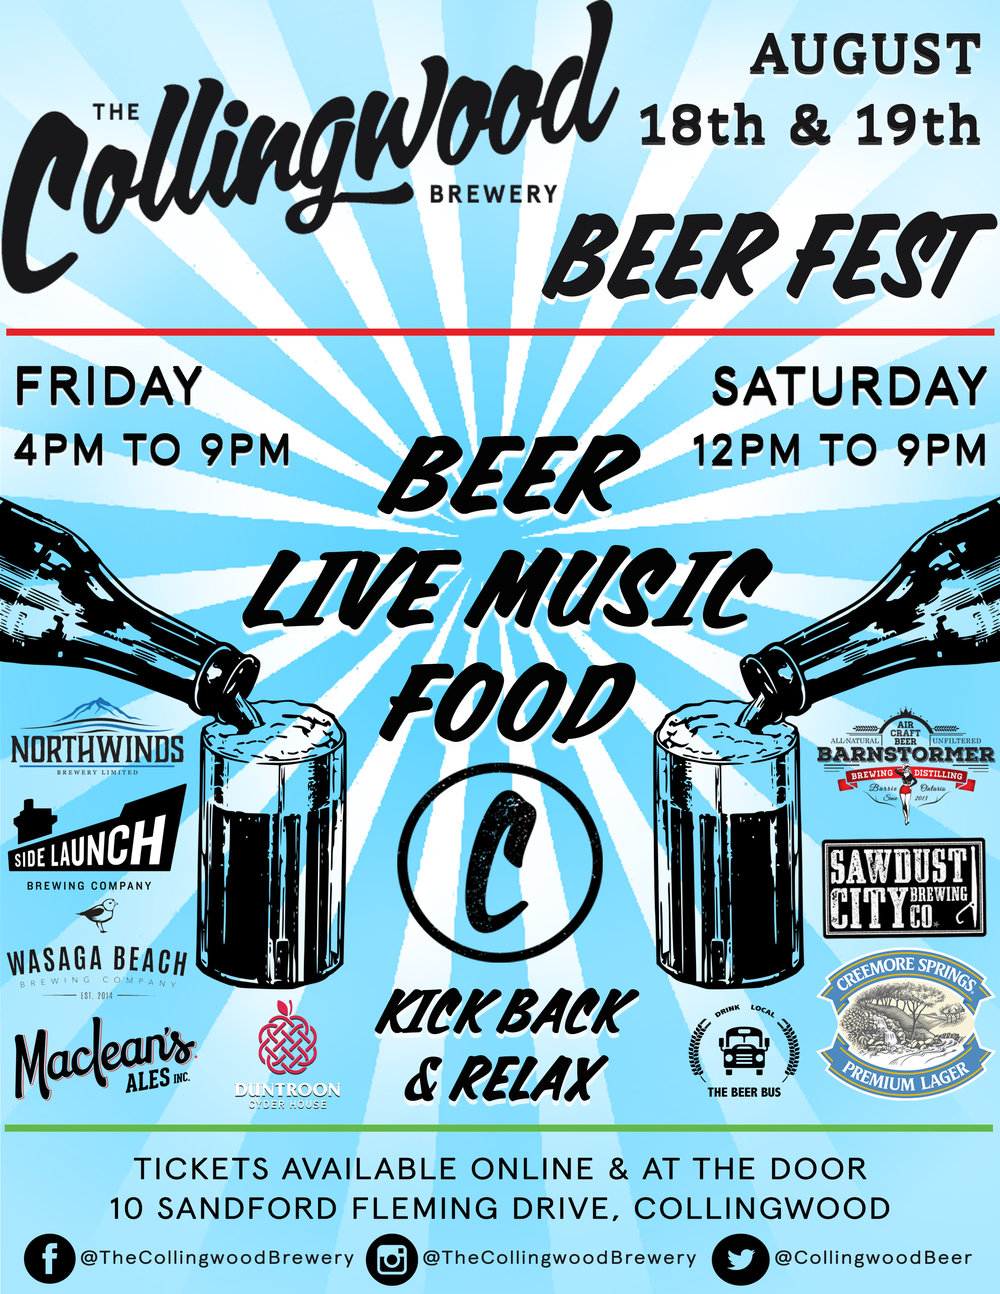 Beer Fest Poster - revision 2.jpg